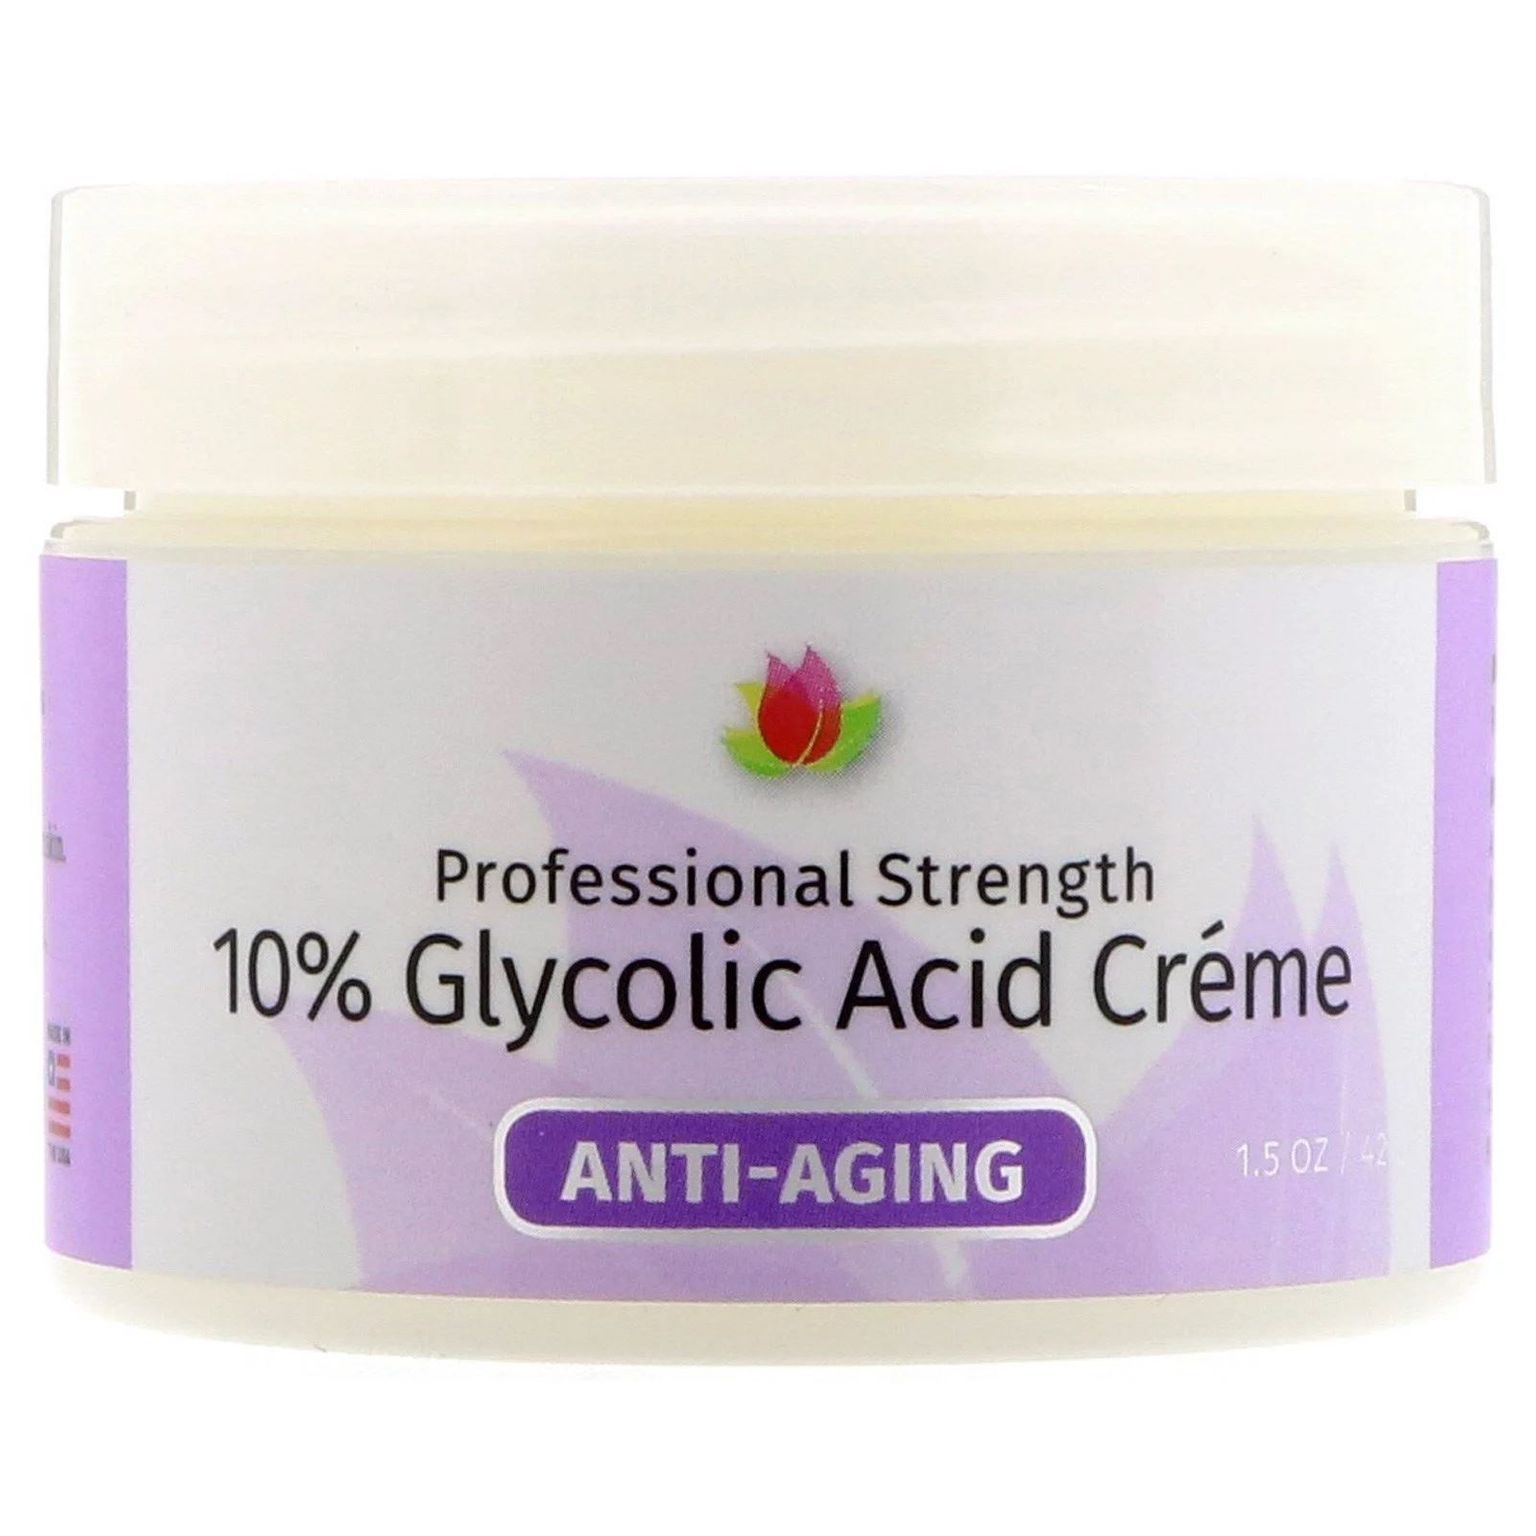 10% Glycolic Acid Cream